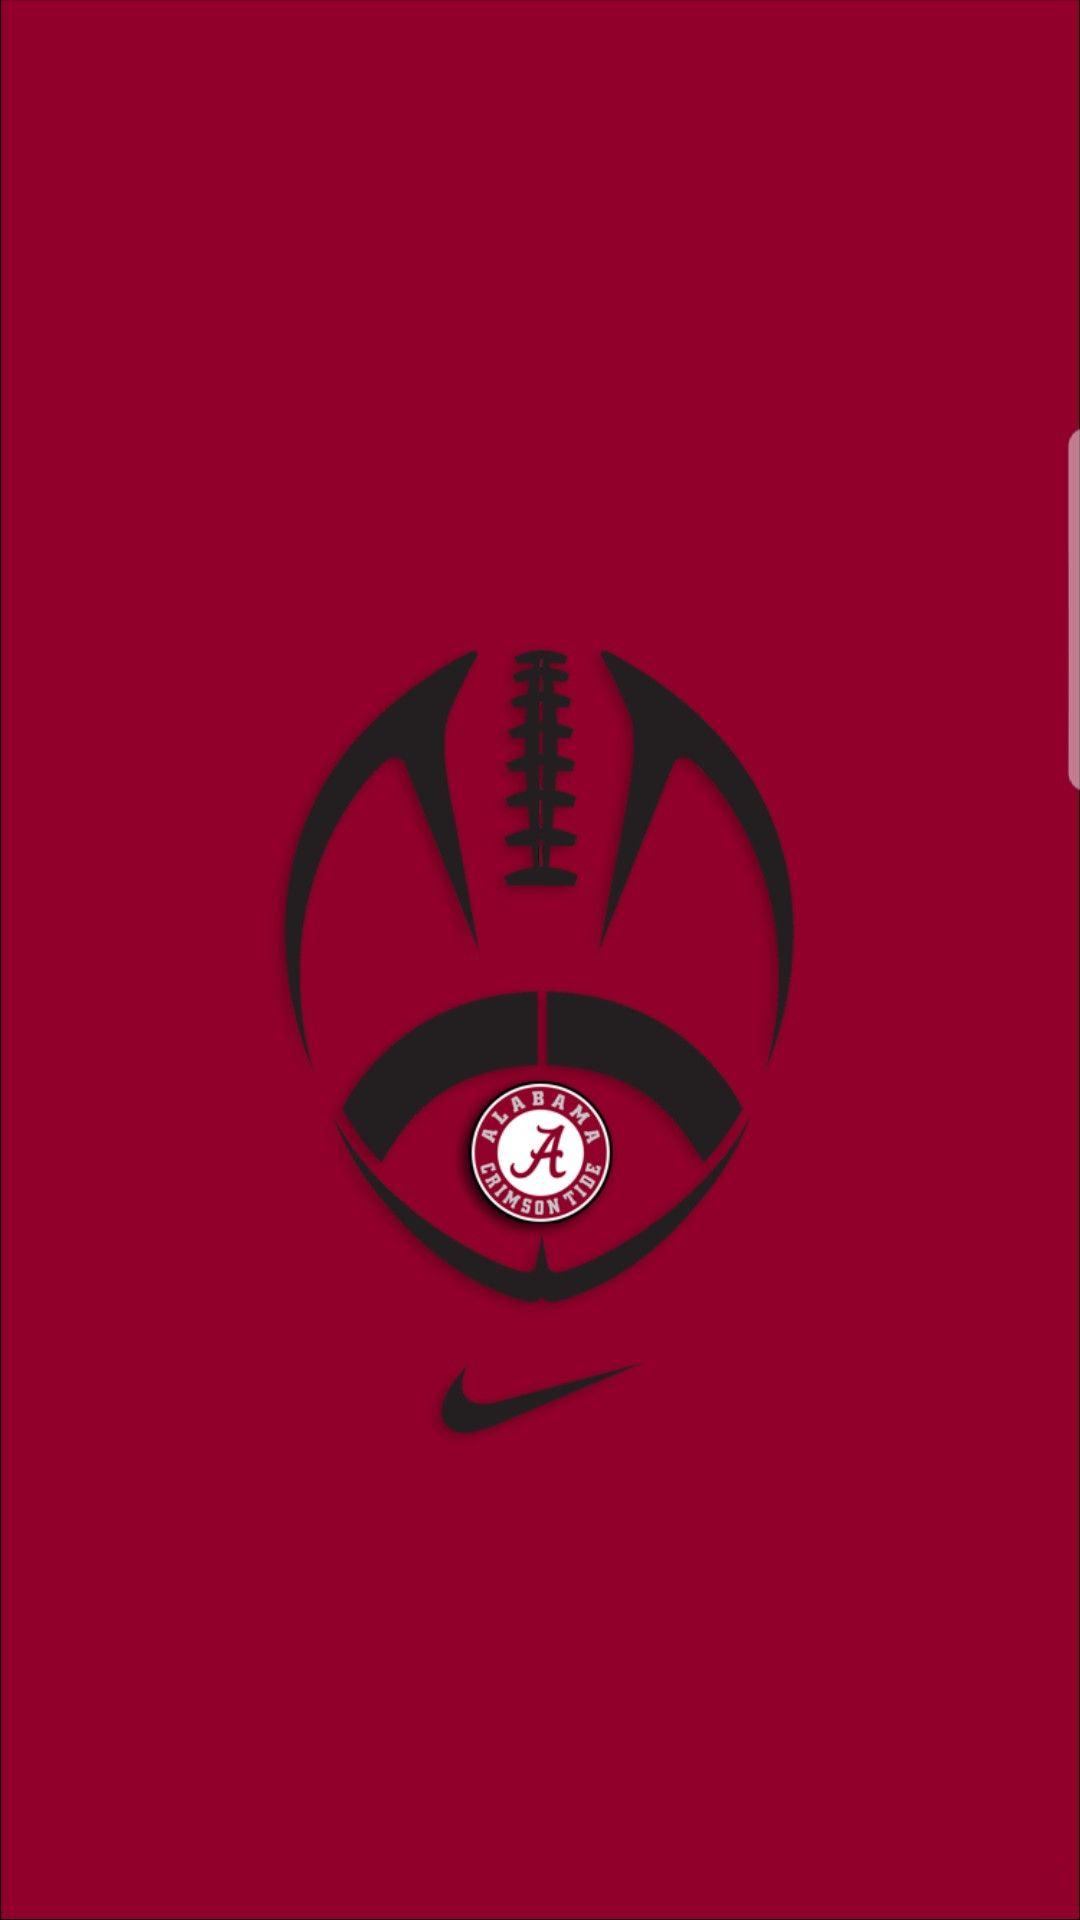 Pin By Archie Douglas On Sportz Wallpaperz Alabama Football Roll Tide Alabama Football Alabama Wallpaper